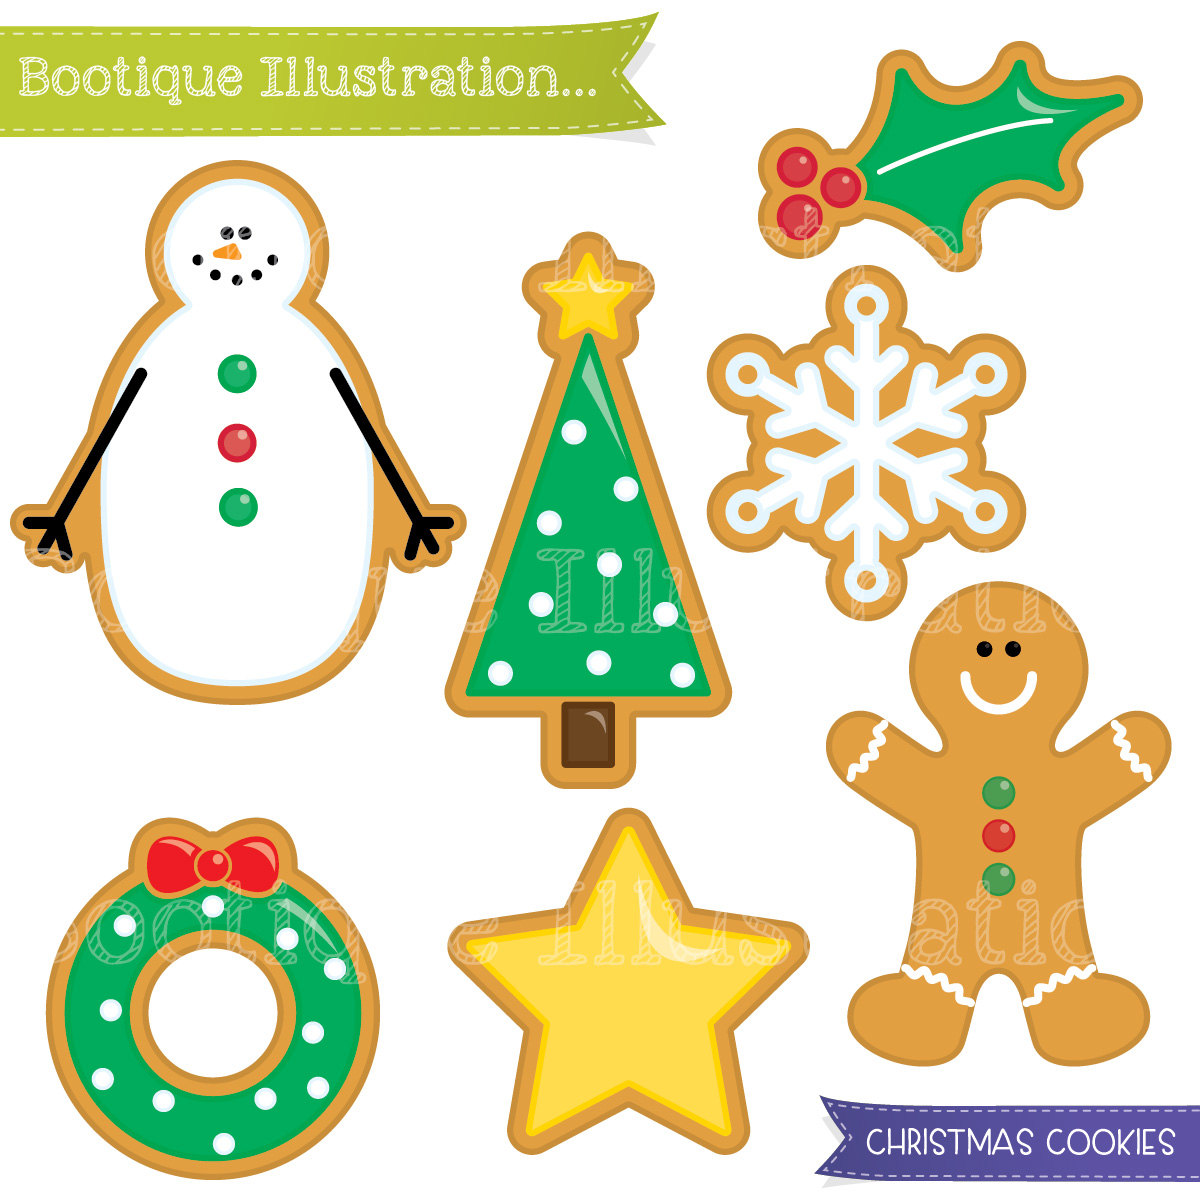 Christmas sugar cookies clipart image free download Free Christmas Cookie Cliparts, Download Free Clip Art, Free Clip ... image free download